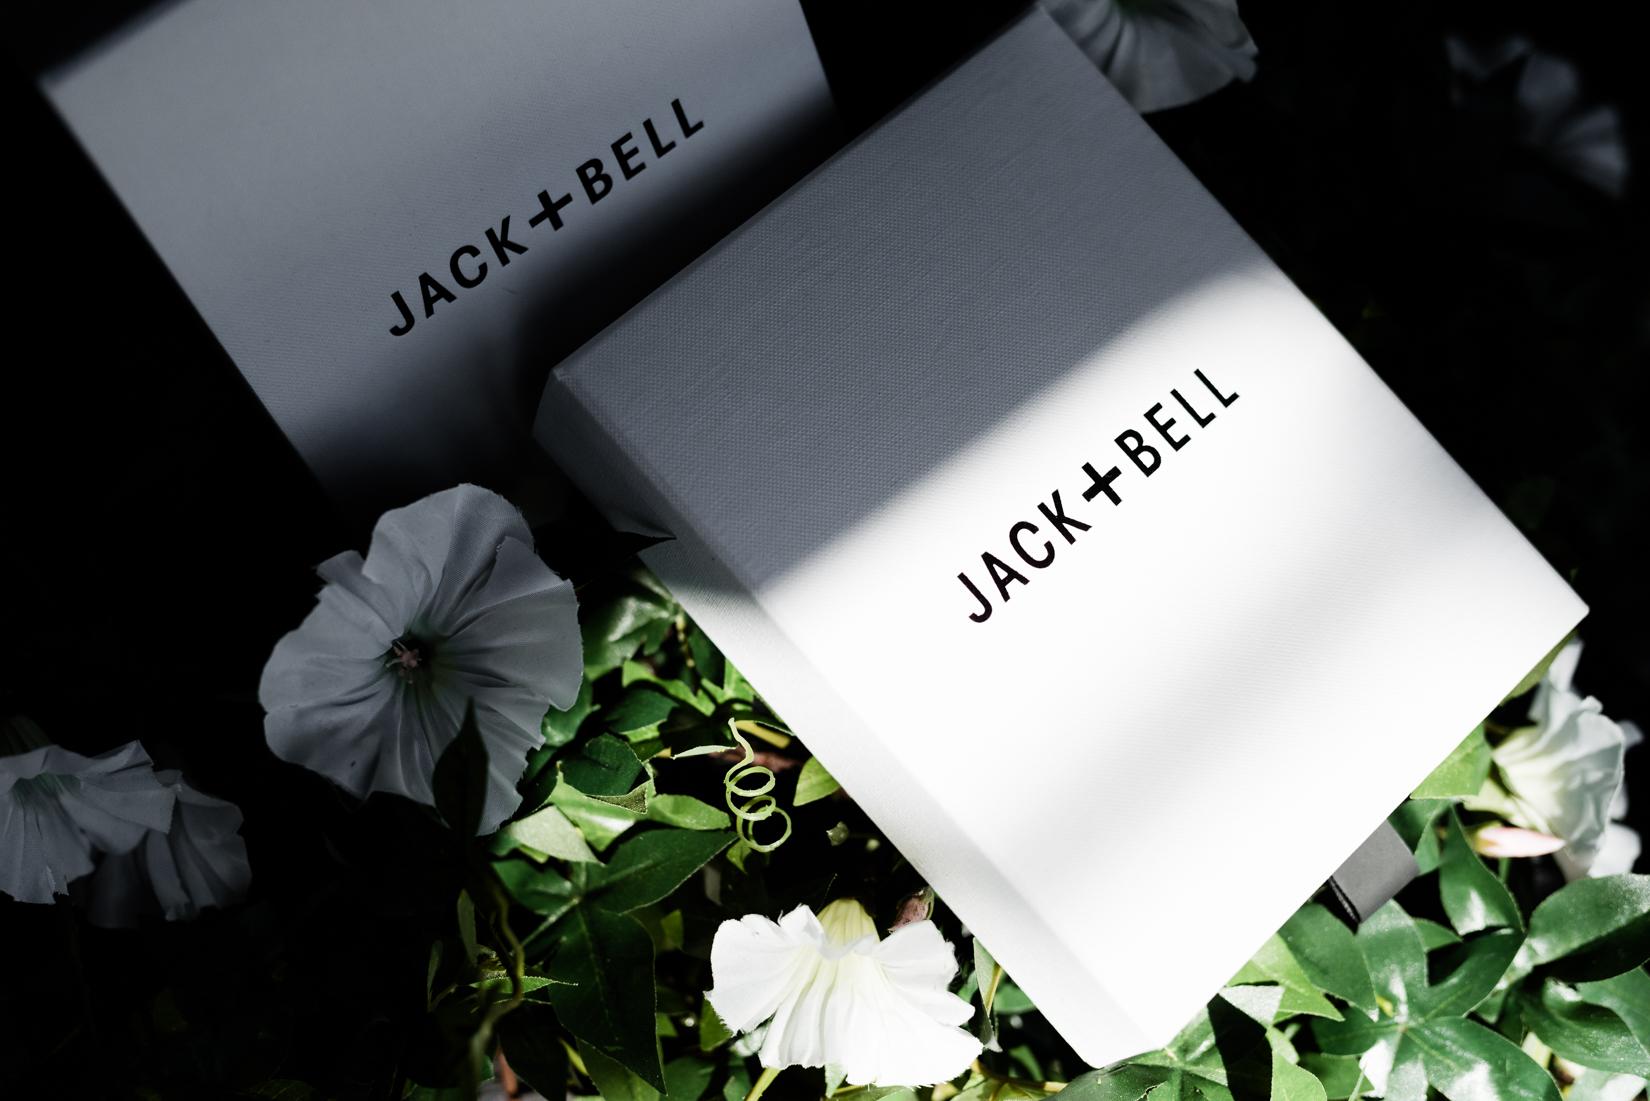 Jack_Bell-280.jpg